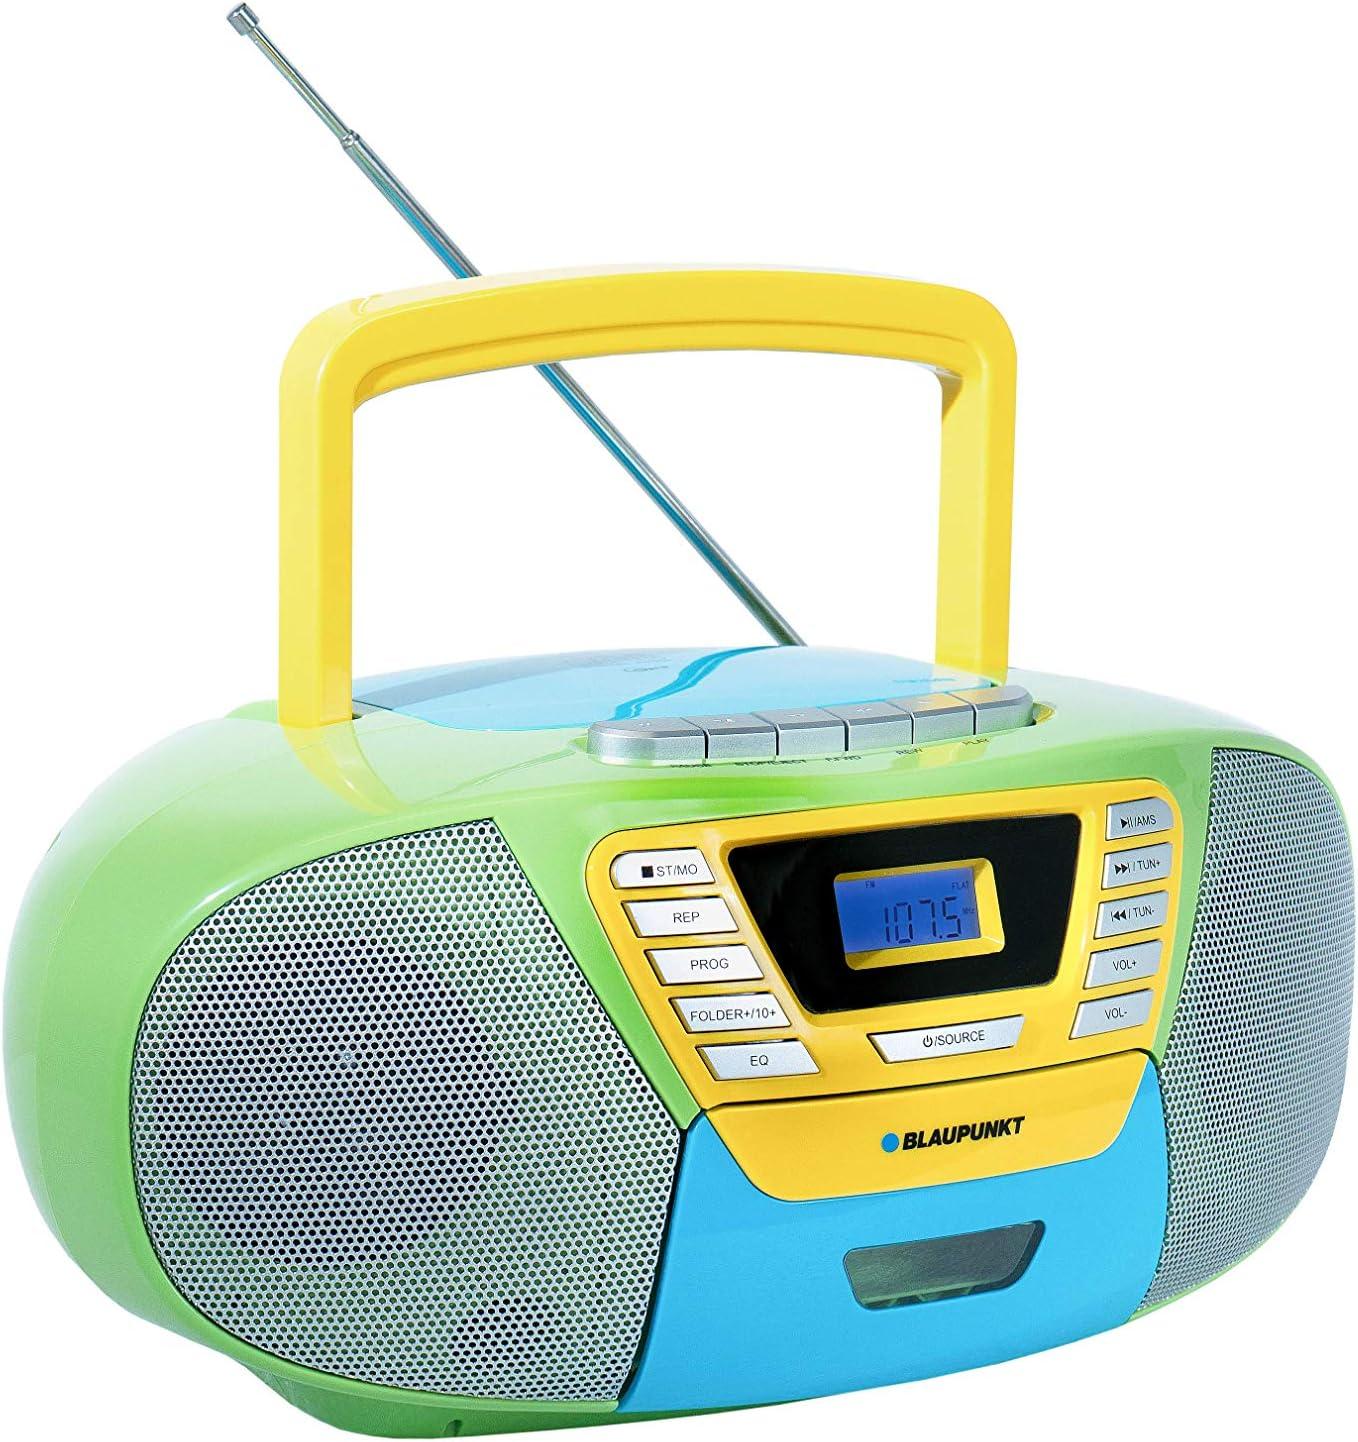 Blaupunkt B 120 Mc Tragbarer Kinder Cd Player Mit Bluetooth Kassettenrekorder Kinder Hörbuch Funktion Cd Player Mit Usb Kleines Cd Radio Aux In Pll Ukw Radio Radio